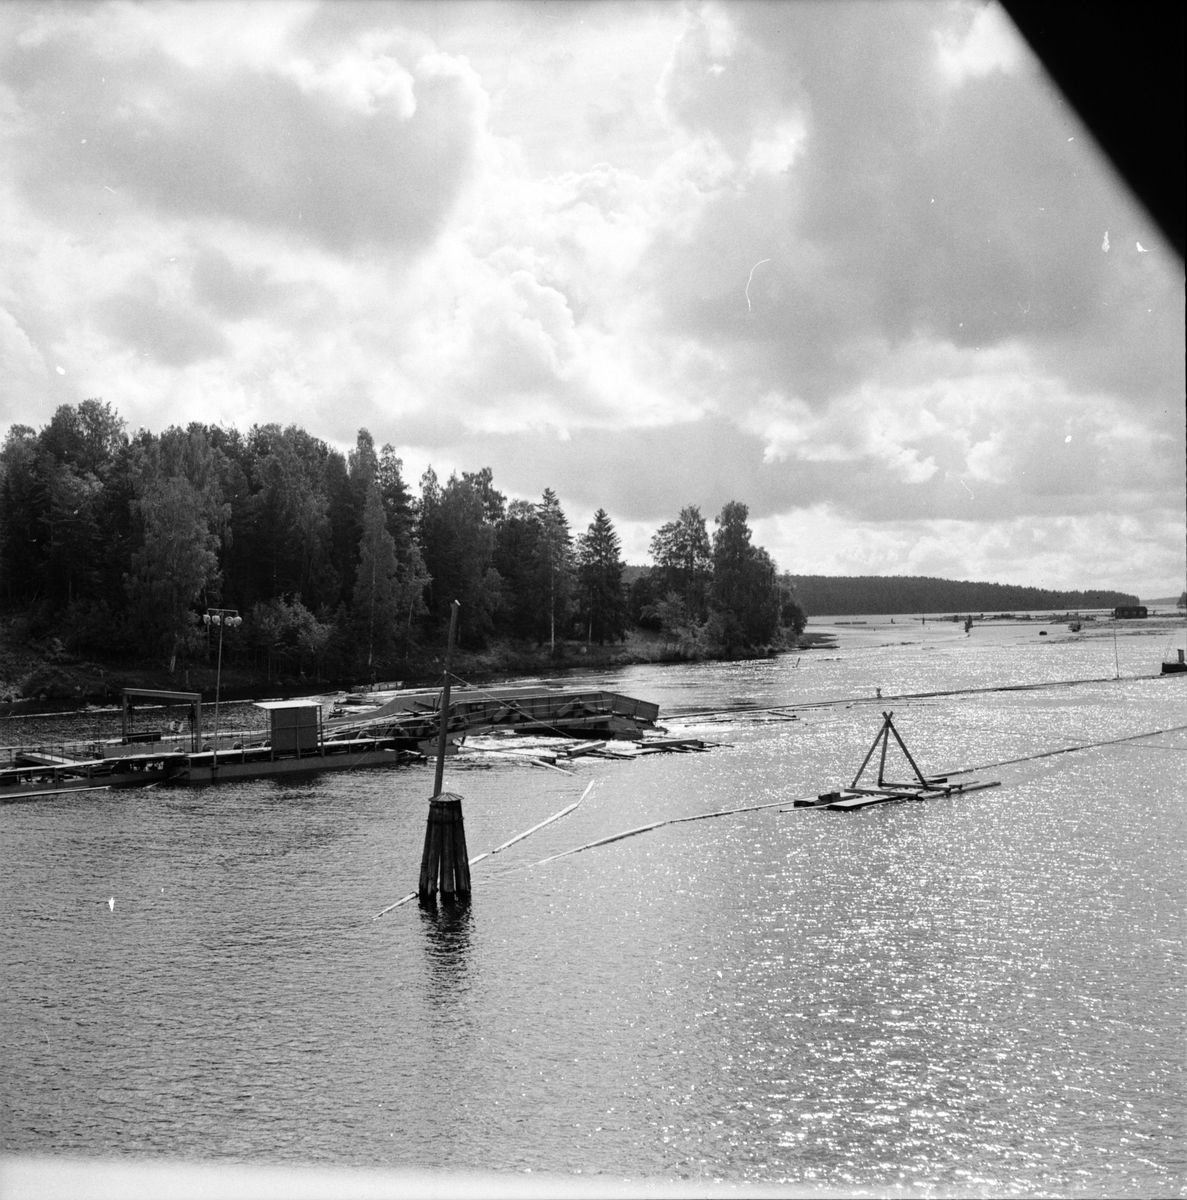 Flottning, Landafors-Bergvik, 6 Juli 1965